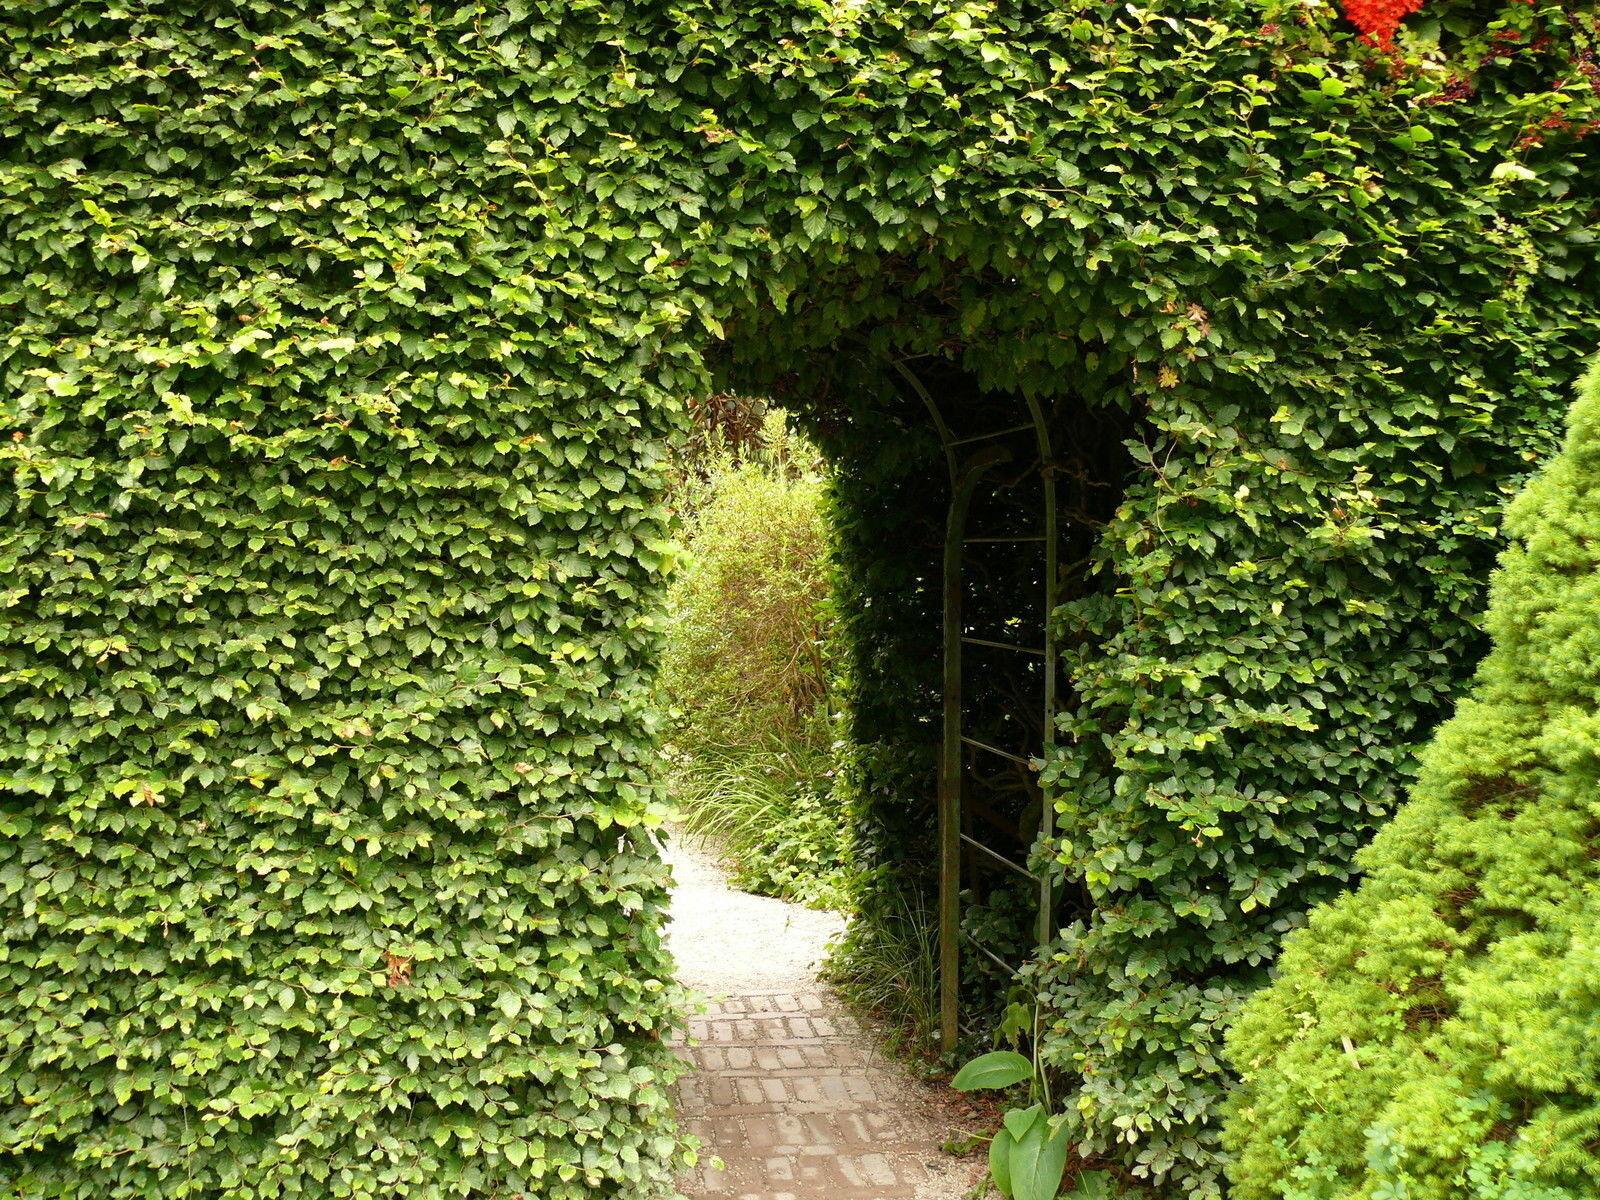 10 Green Beech Hedging Plants Us Sylvatica Trees 30 50cm Copper In Winter